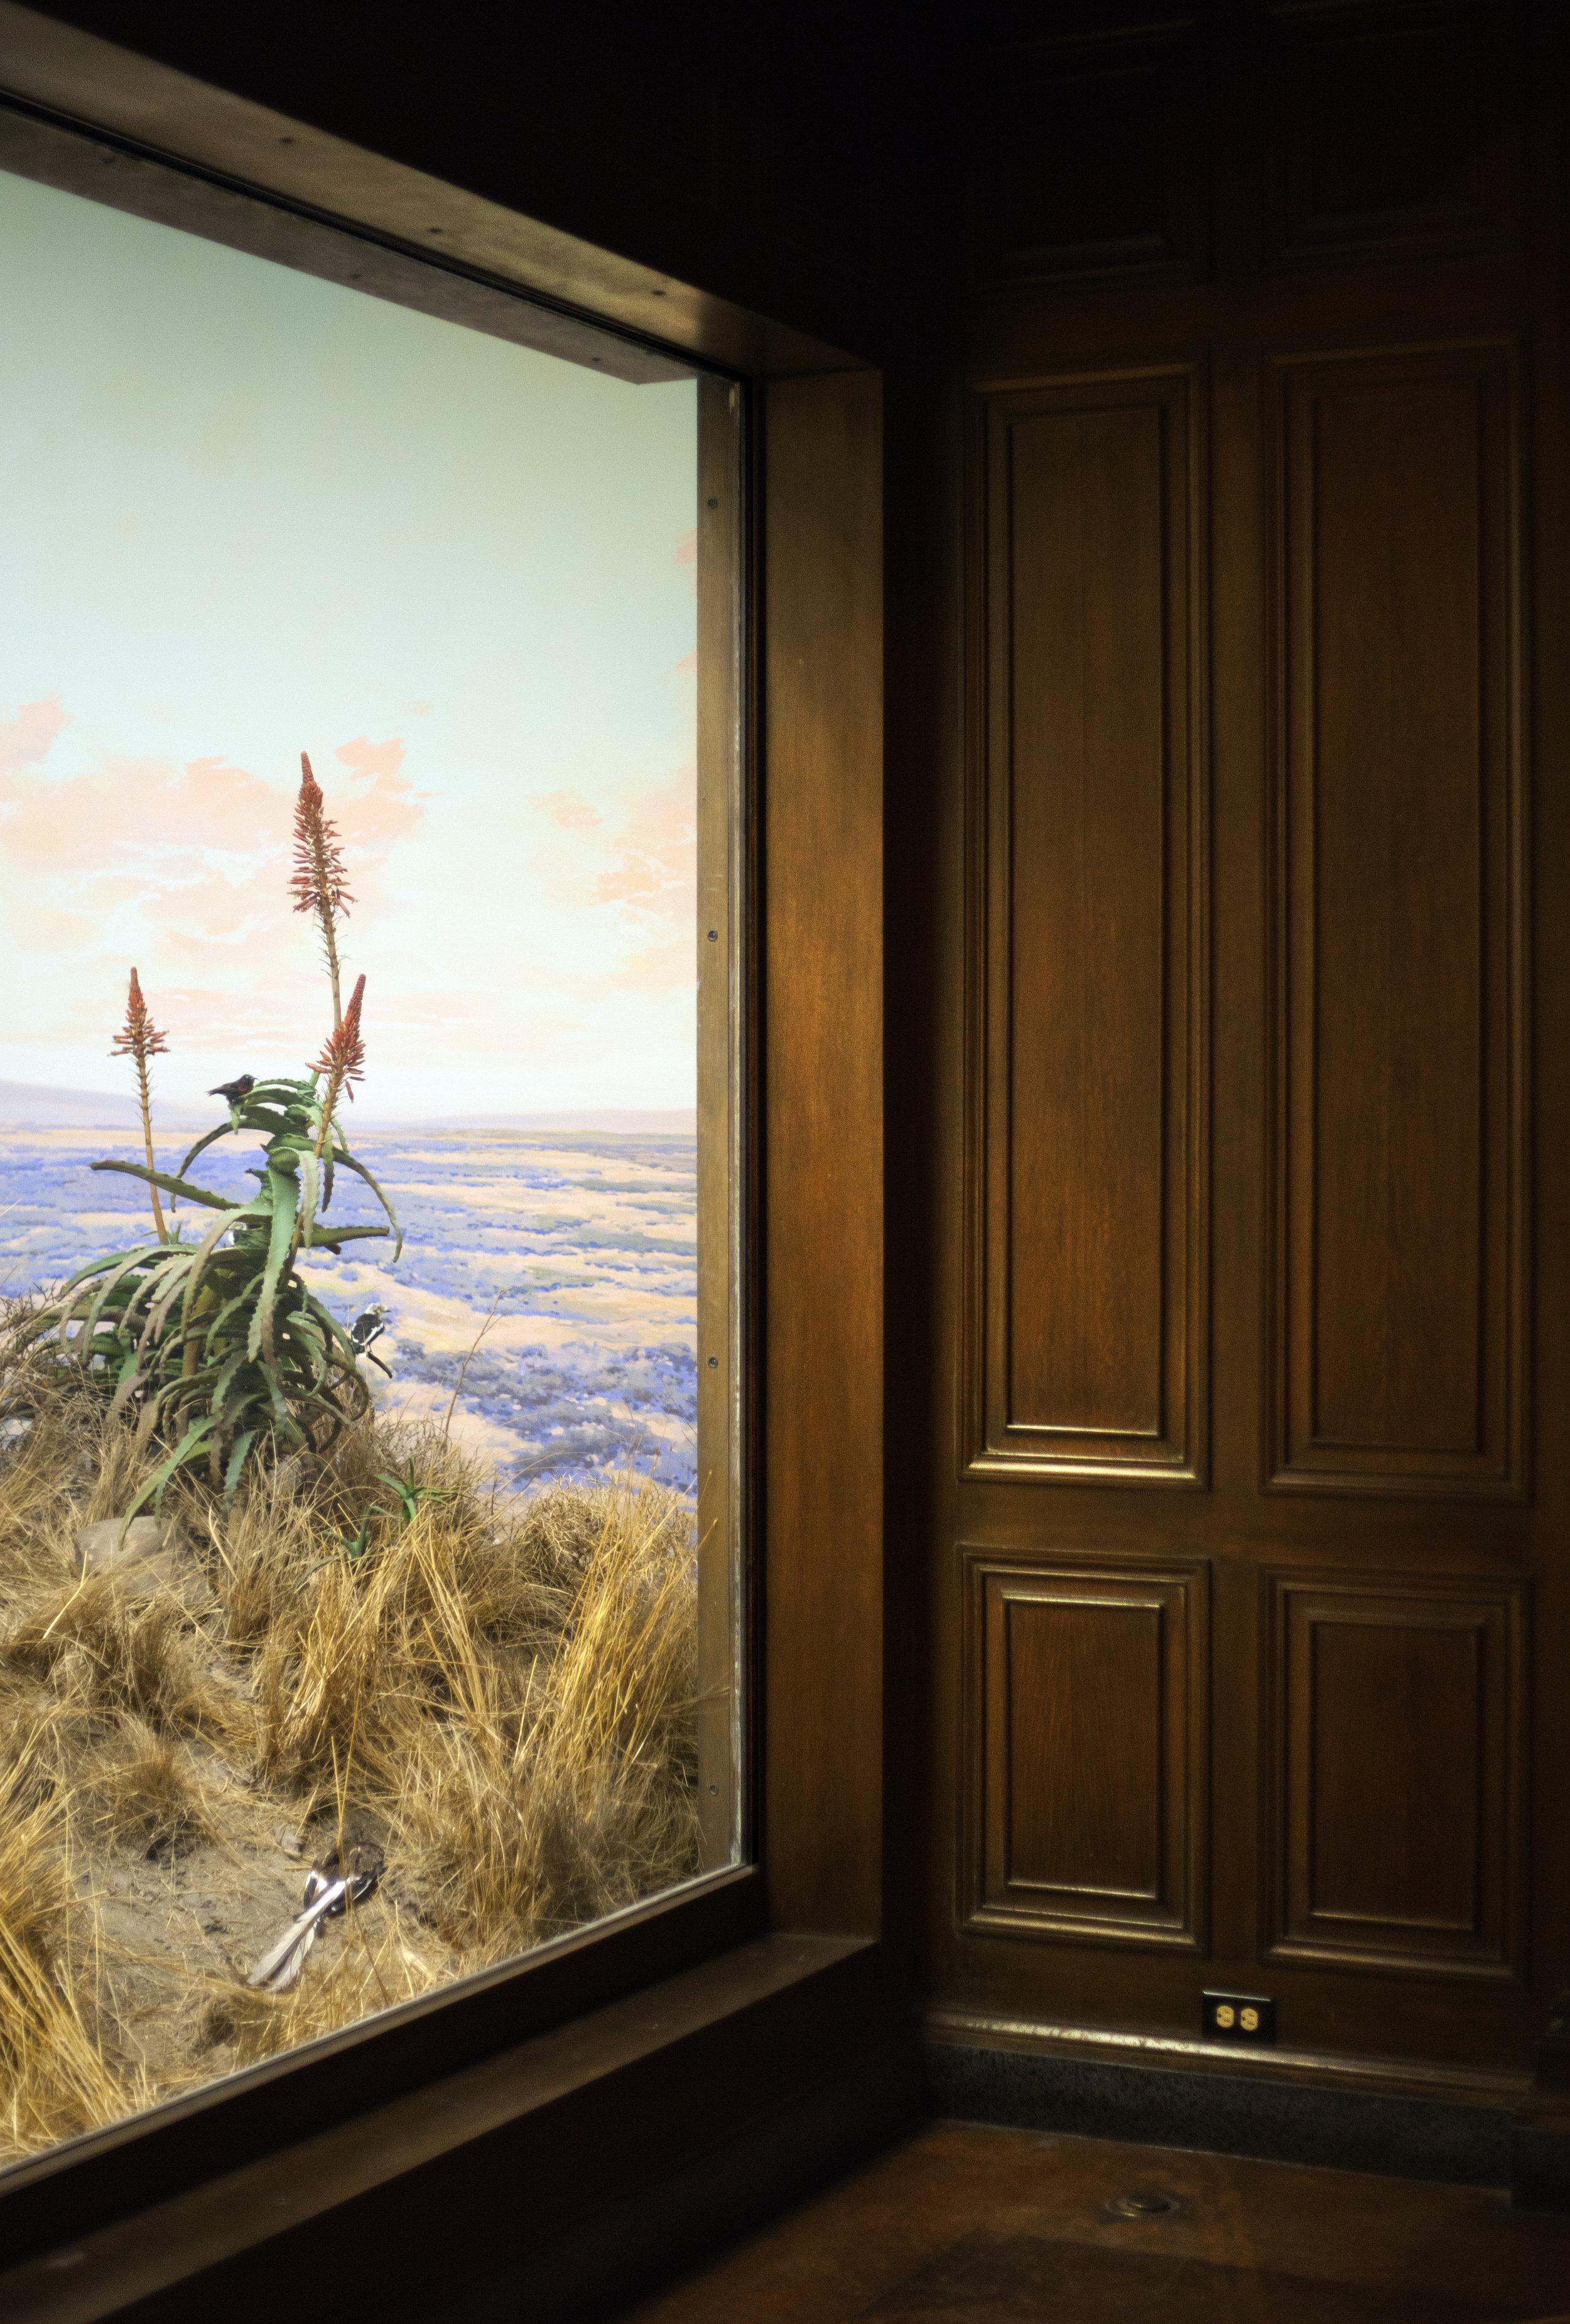 "Plateau (Laikipia, Kenya), 2012, Archival Inkjet Print, 38"" x 46"" inches"